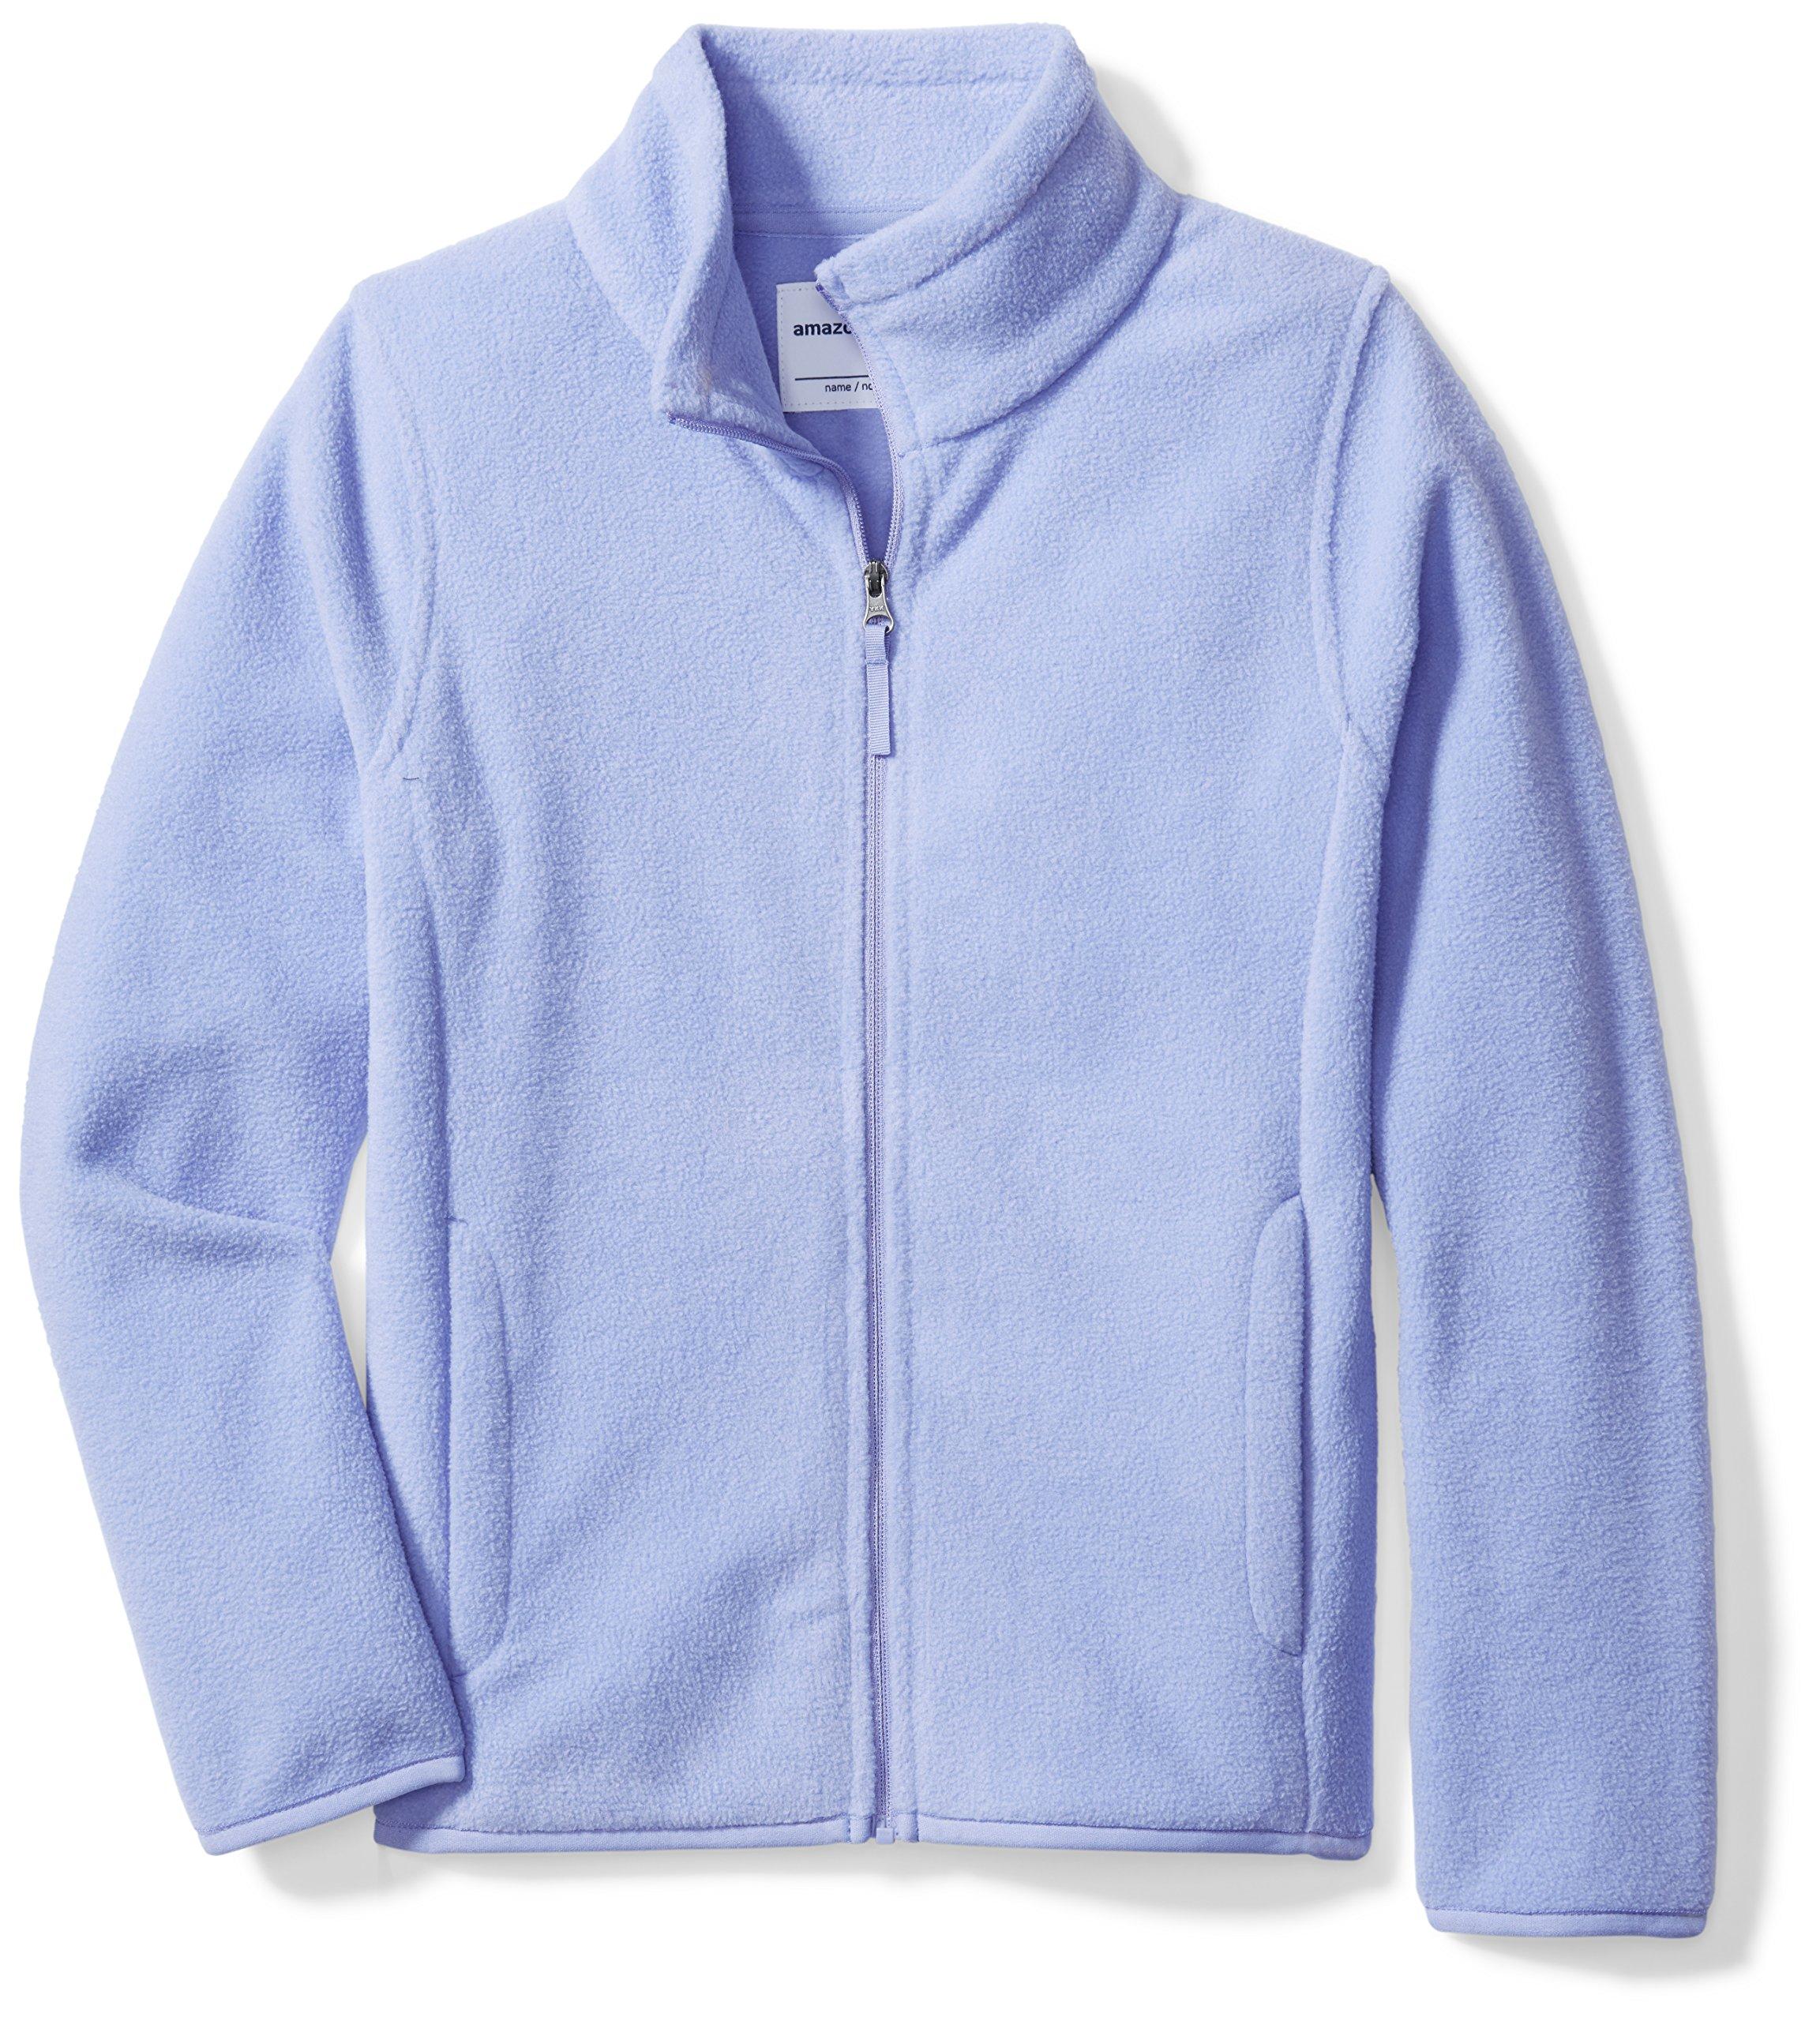 Amazon Essentials Girls' Full-Zip Polar Fleece Jacket, Periwinkle Purple, Medium